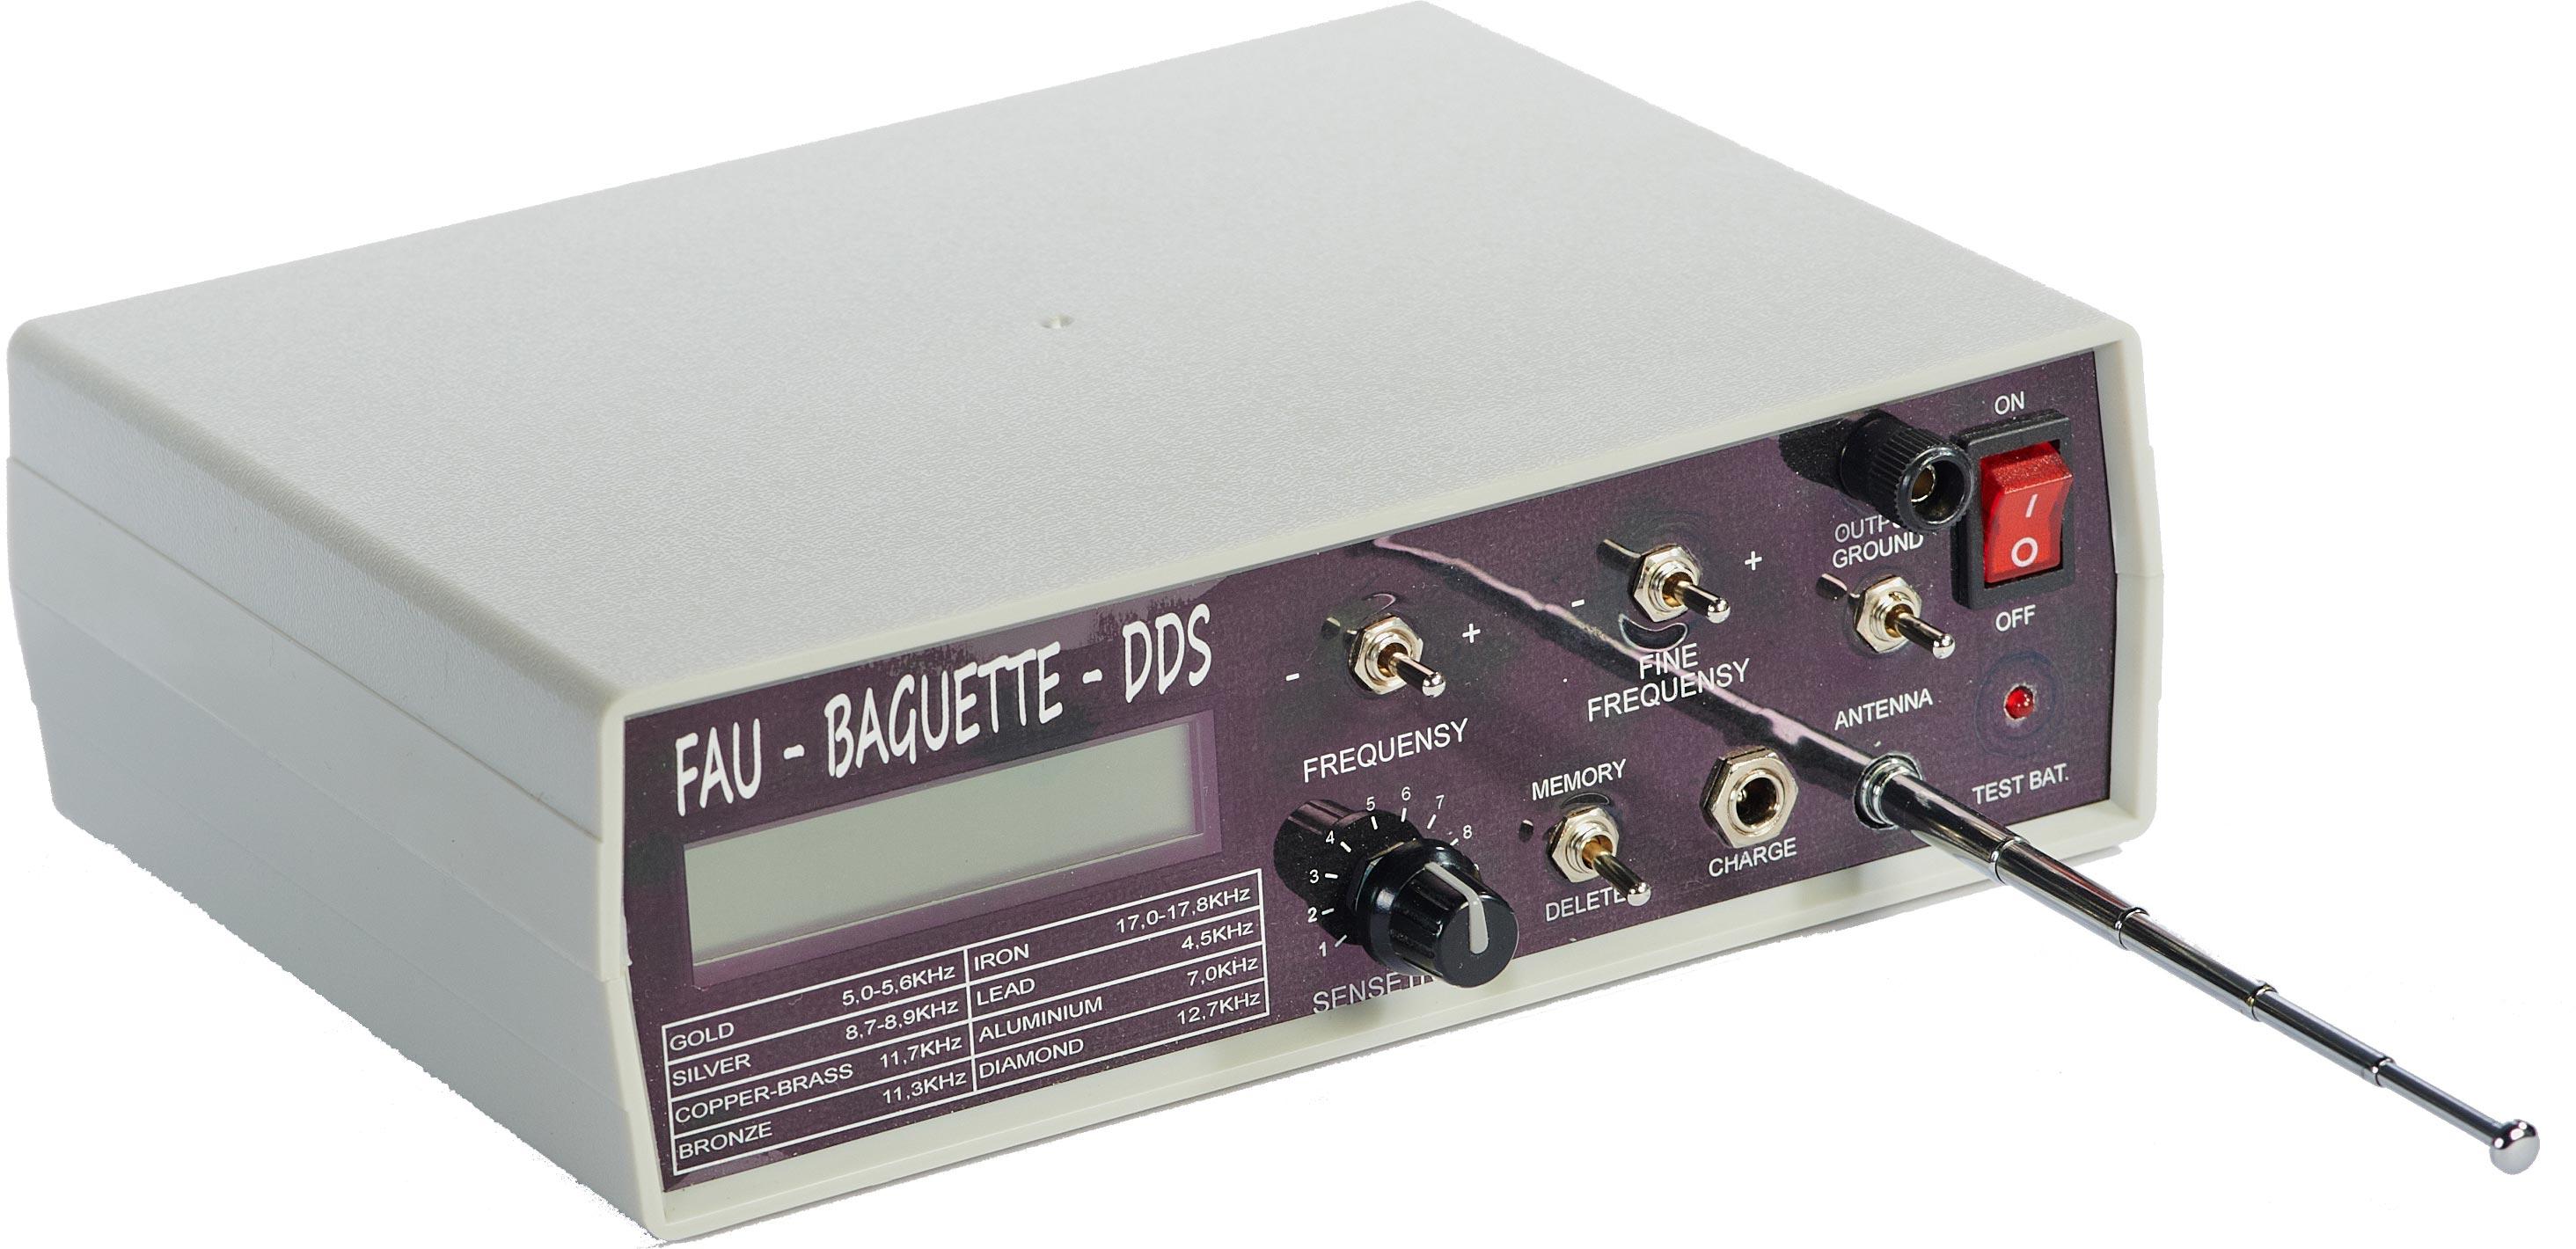 Long Range Locators Software Help Output Circuit Of Pi Metal Detector Longrangelocators Forums Fau Baguette Dds Digital Locator